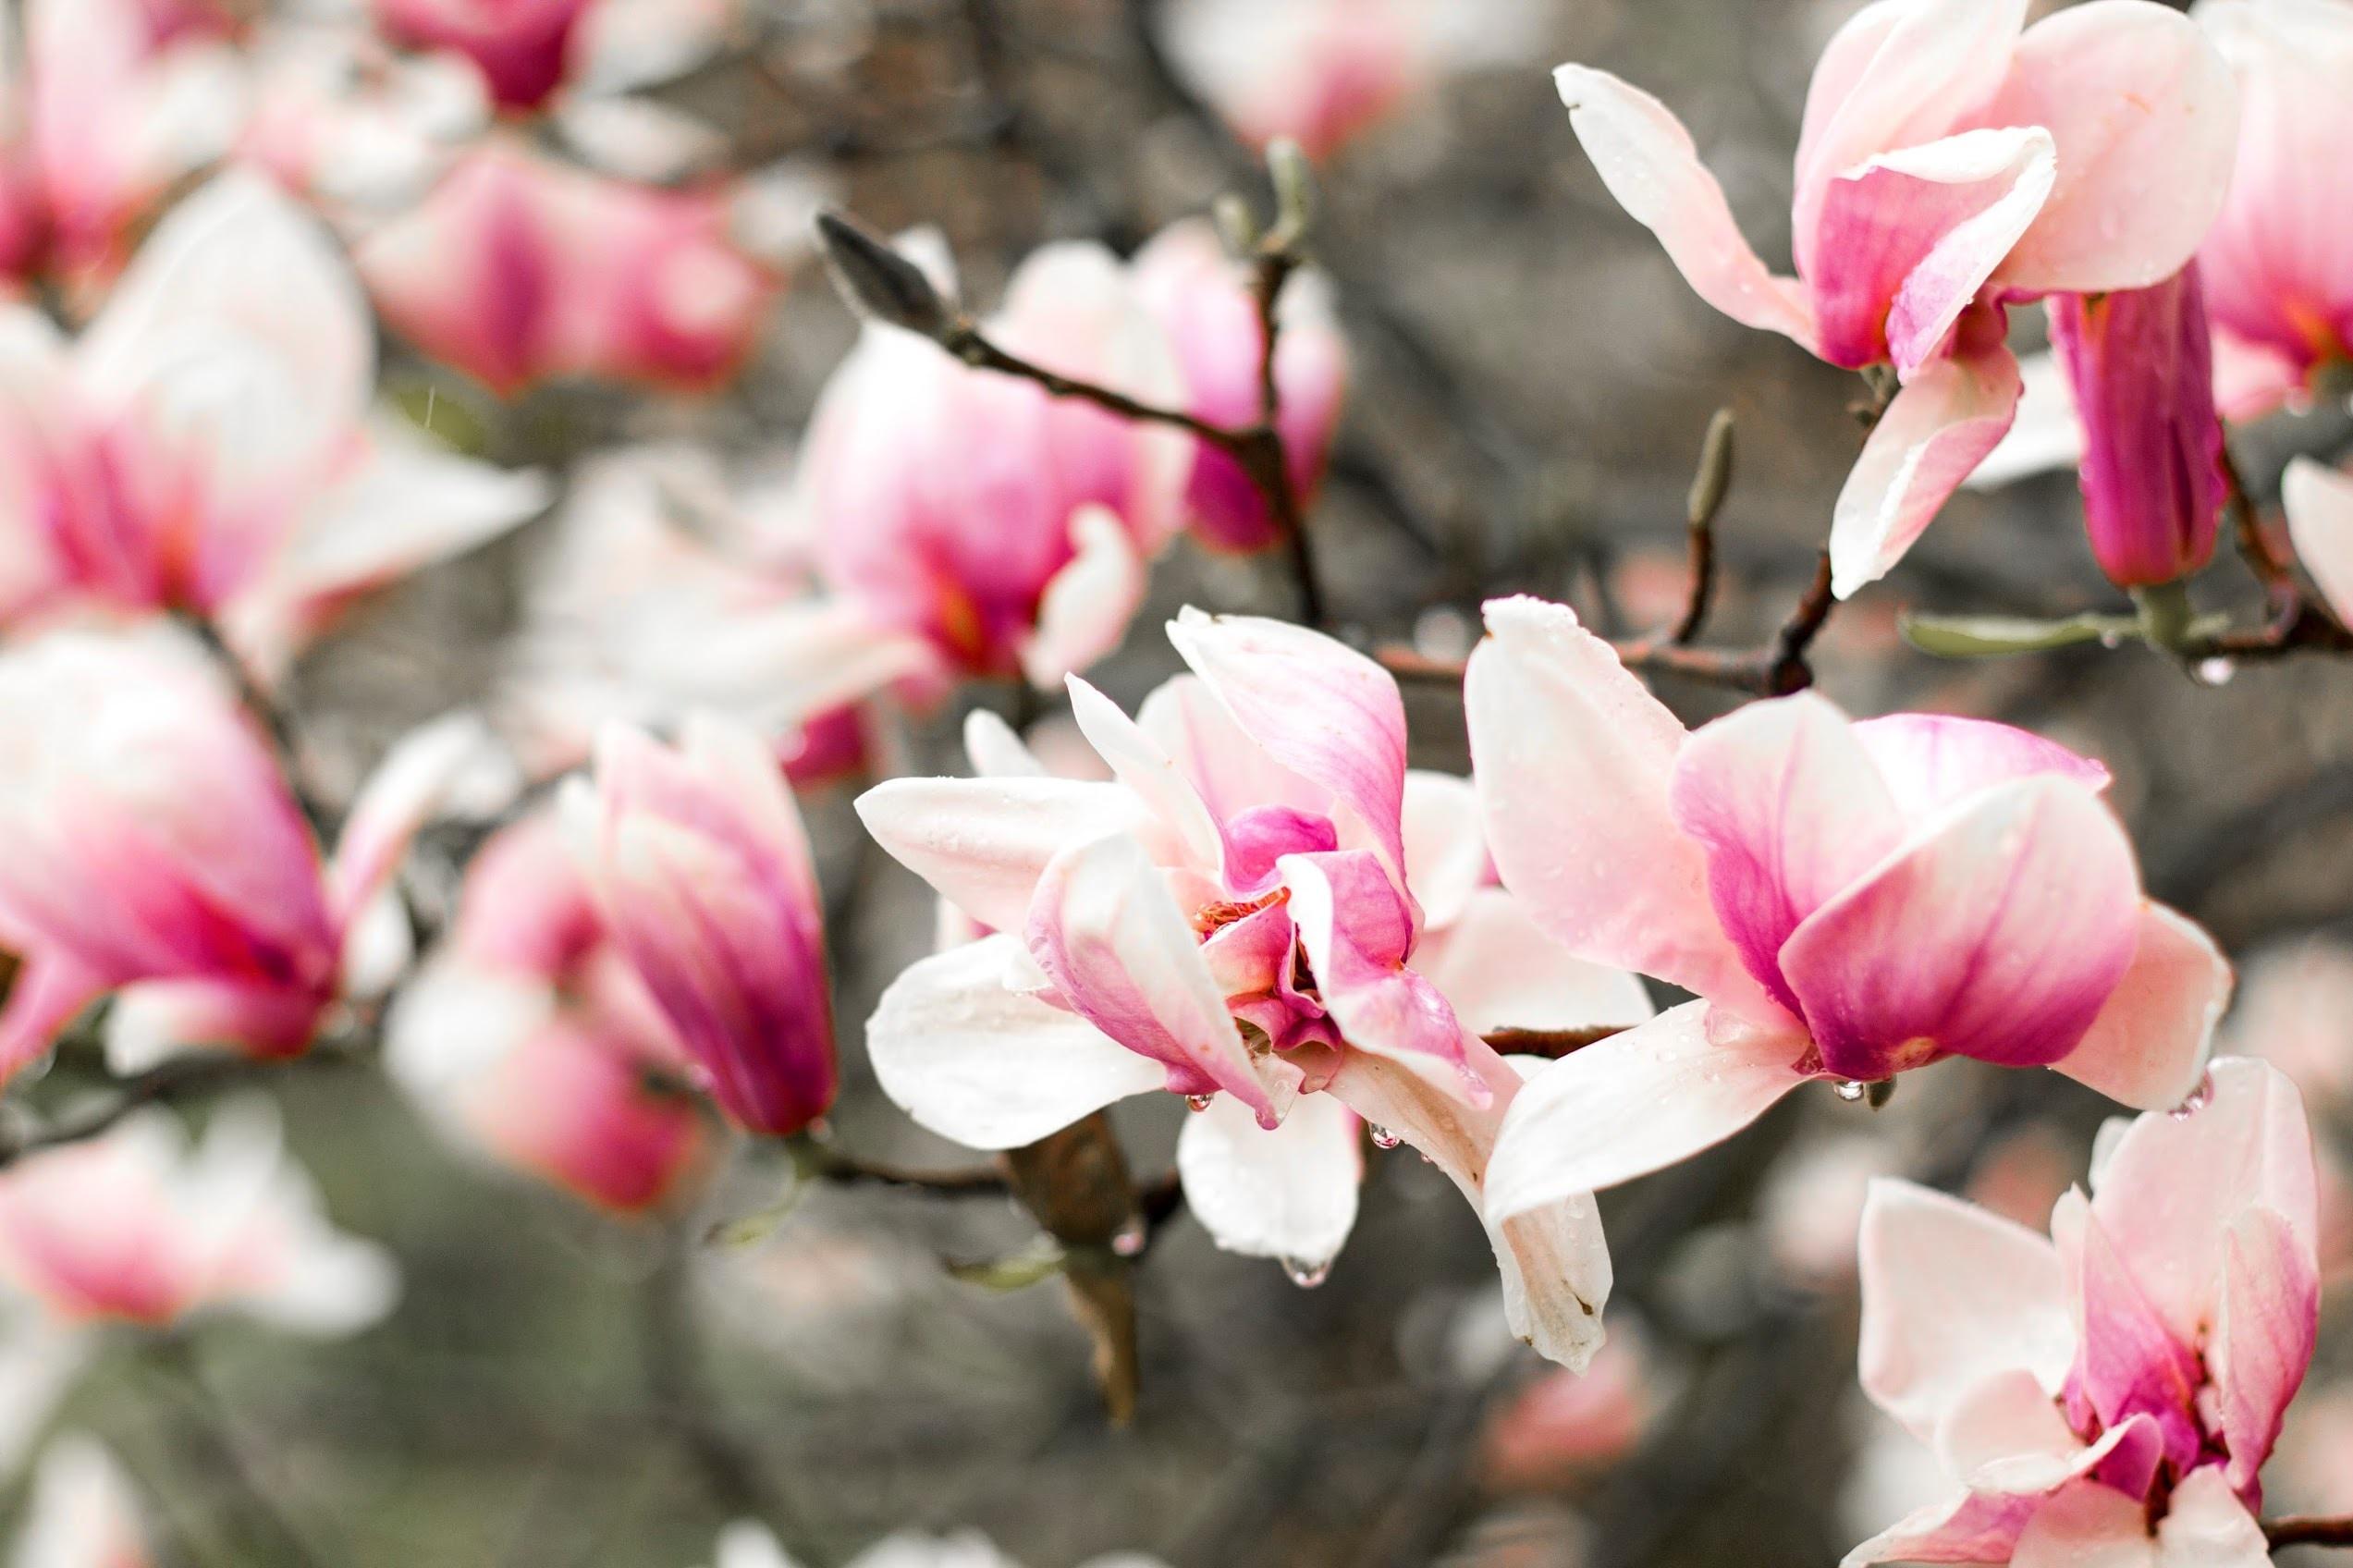 closeup photo of cherry blossoms